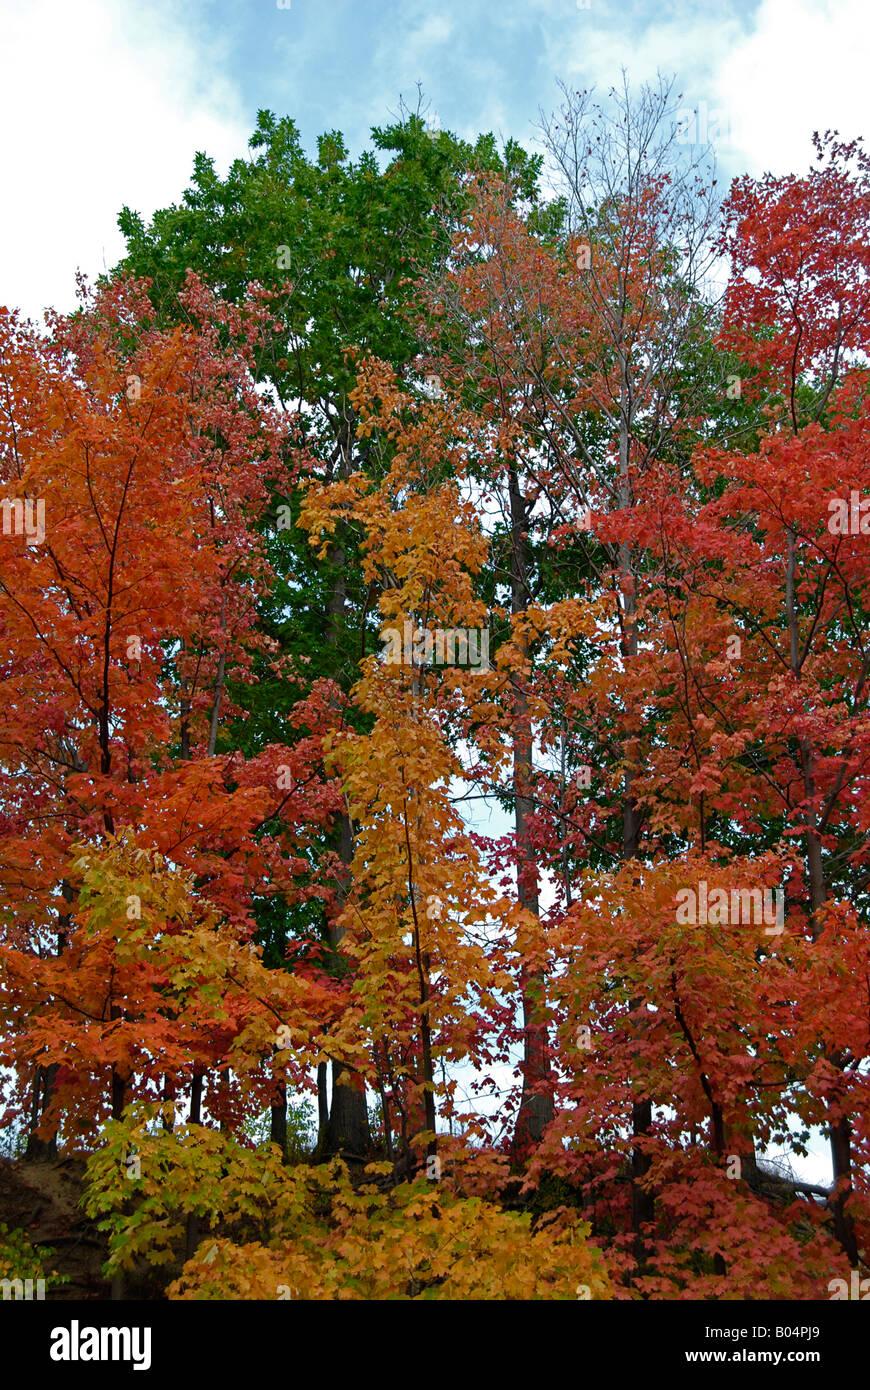 Trees in Autumn - Stock Image